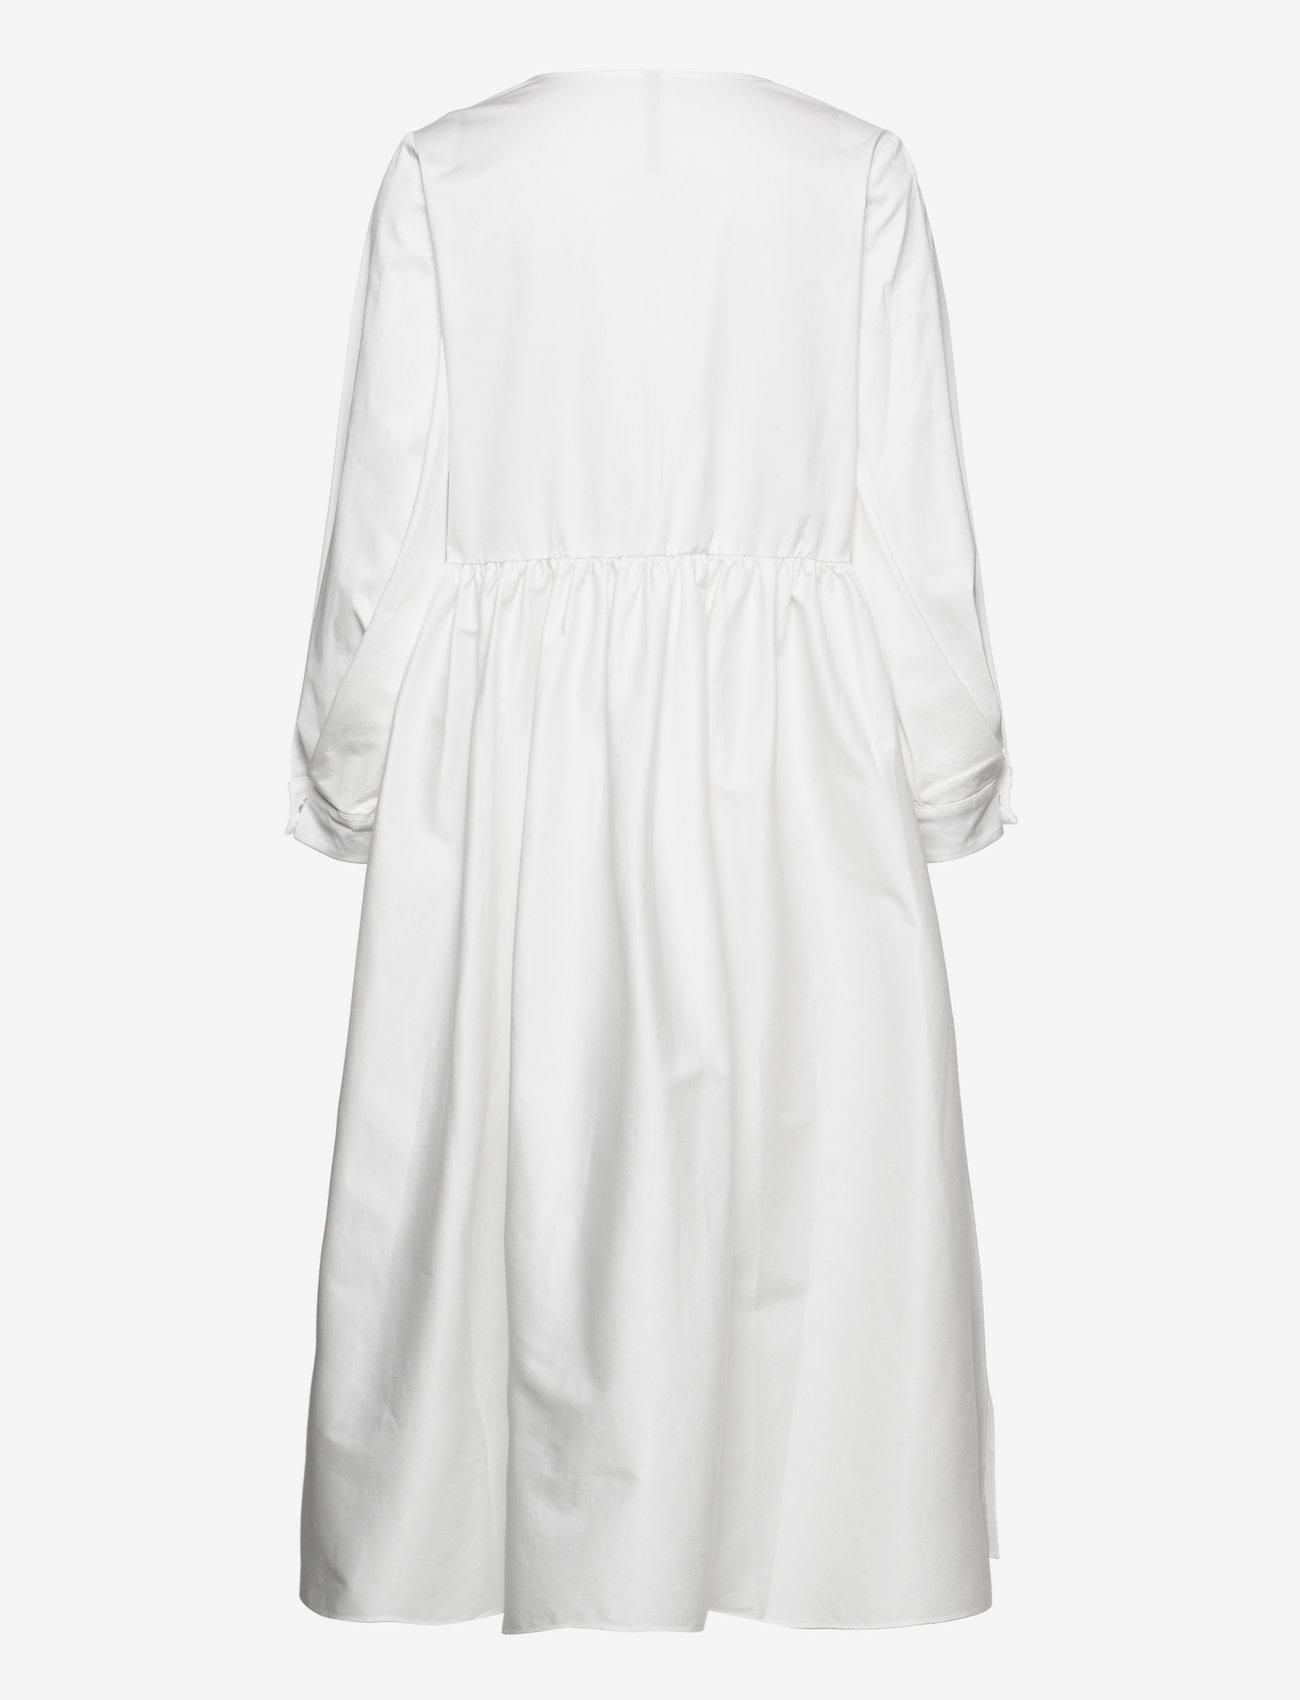 Mother of Pearl - DANICA WHITE DRESS - summer dresses - white - 1